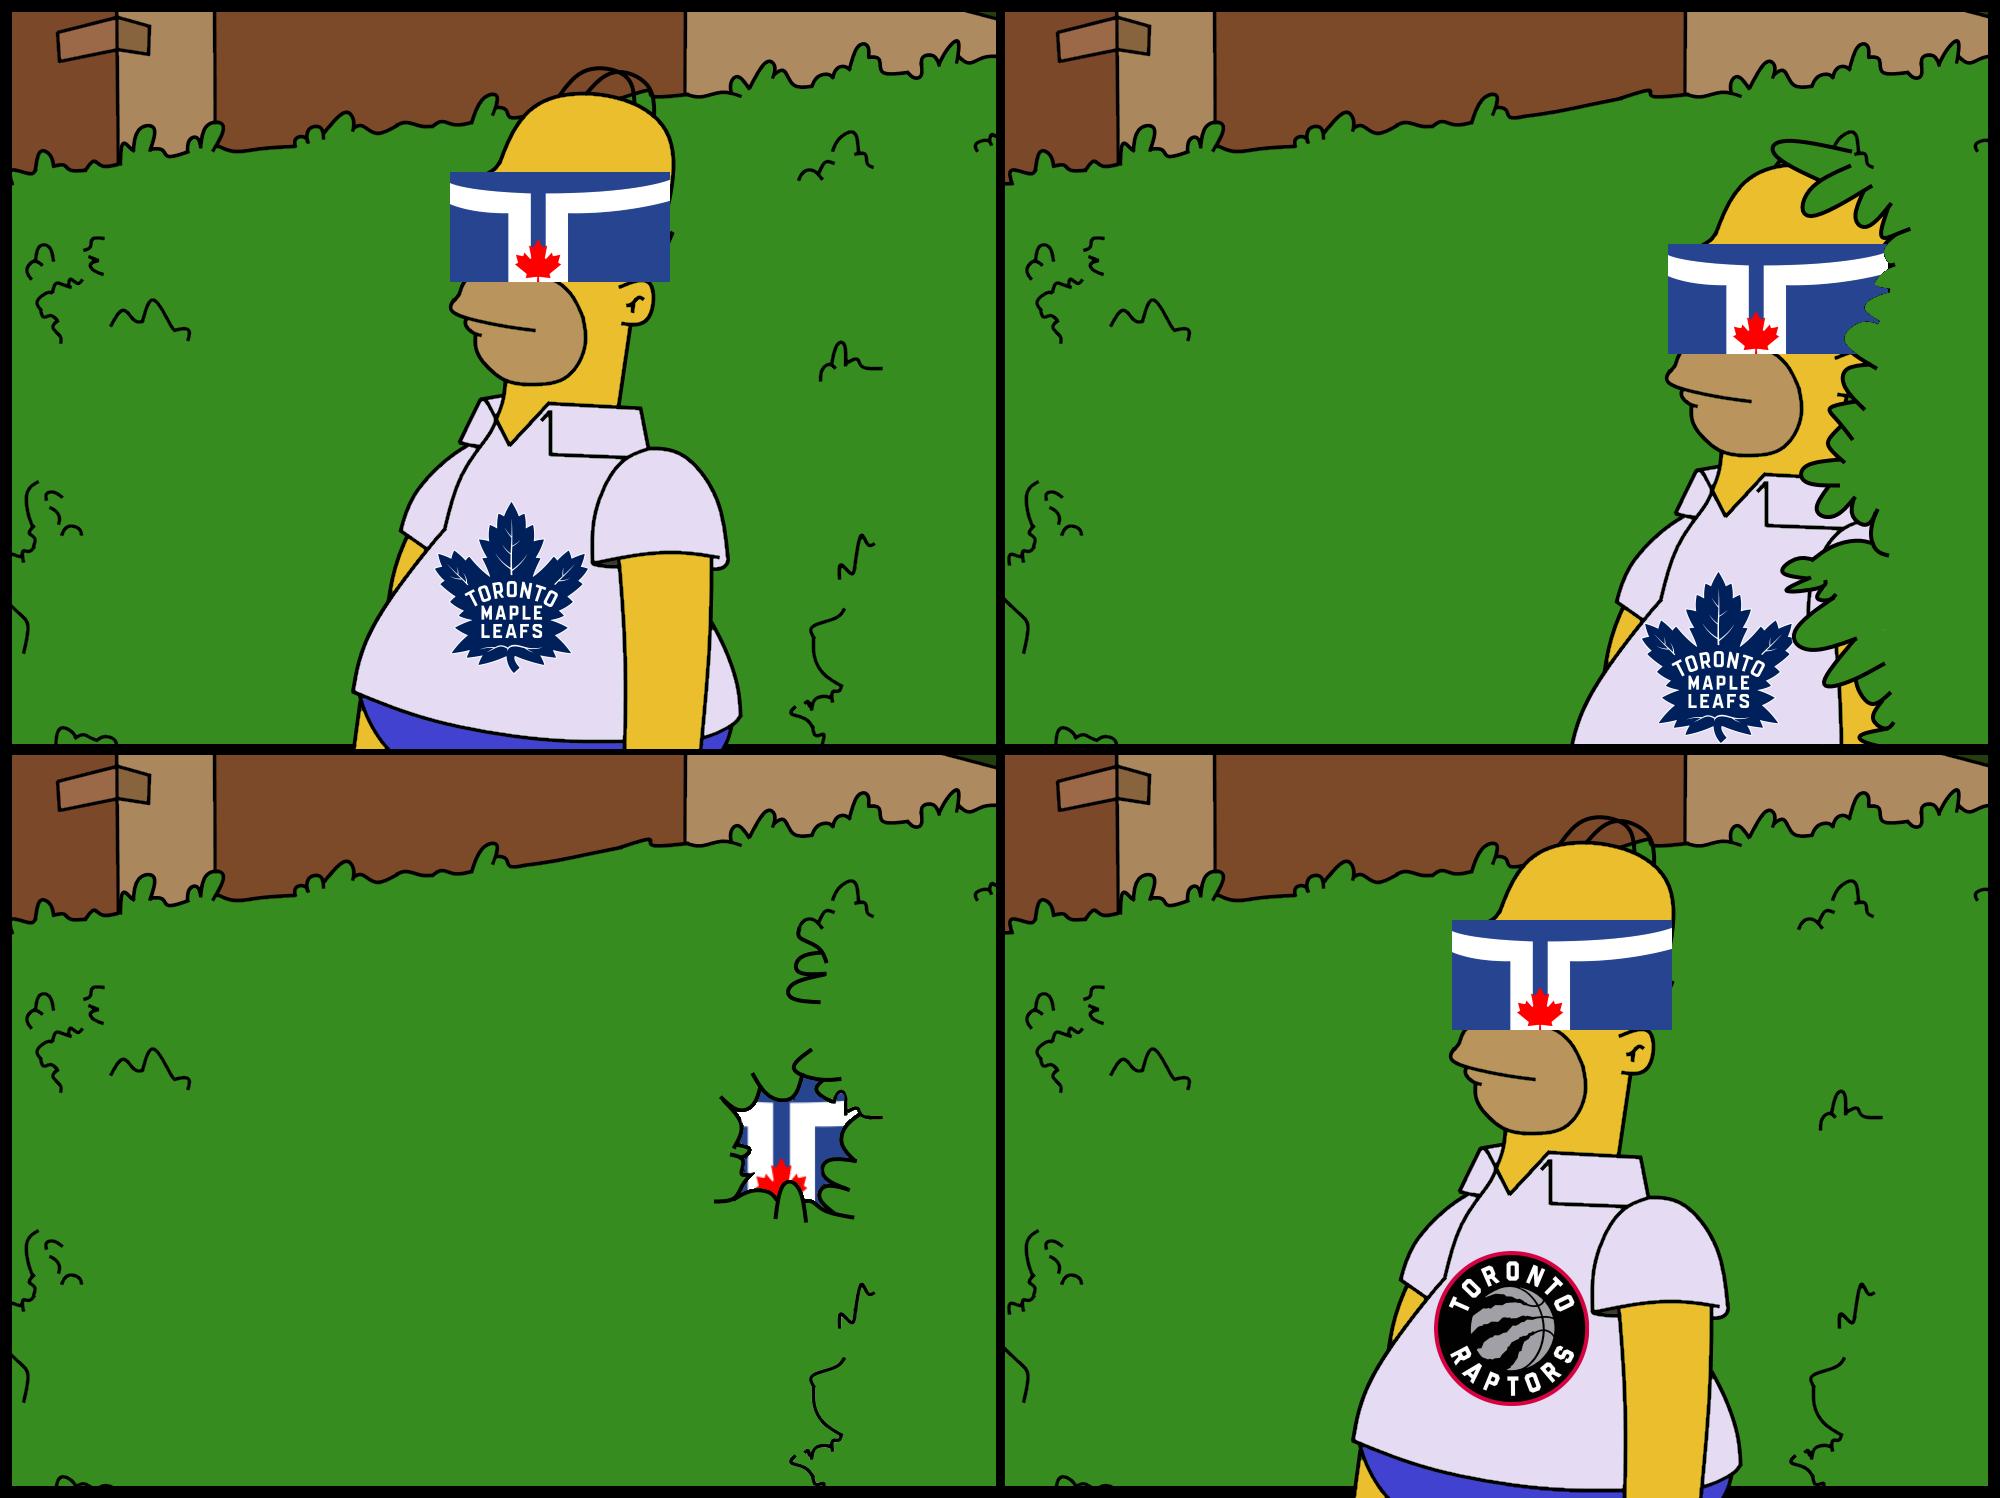 Toronto | Homer Simpson Backs Into Bushes | Know Your Meme